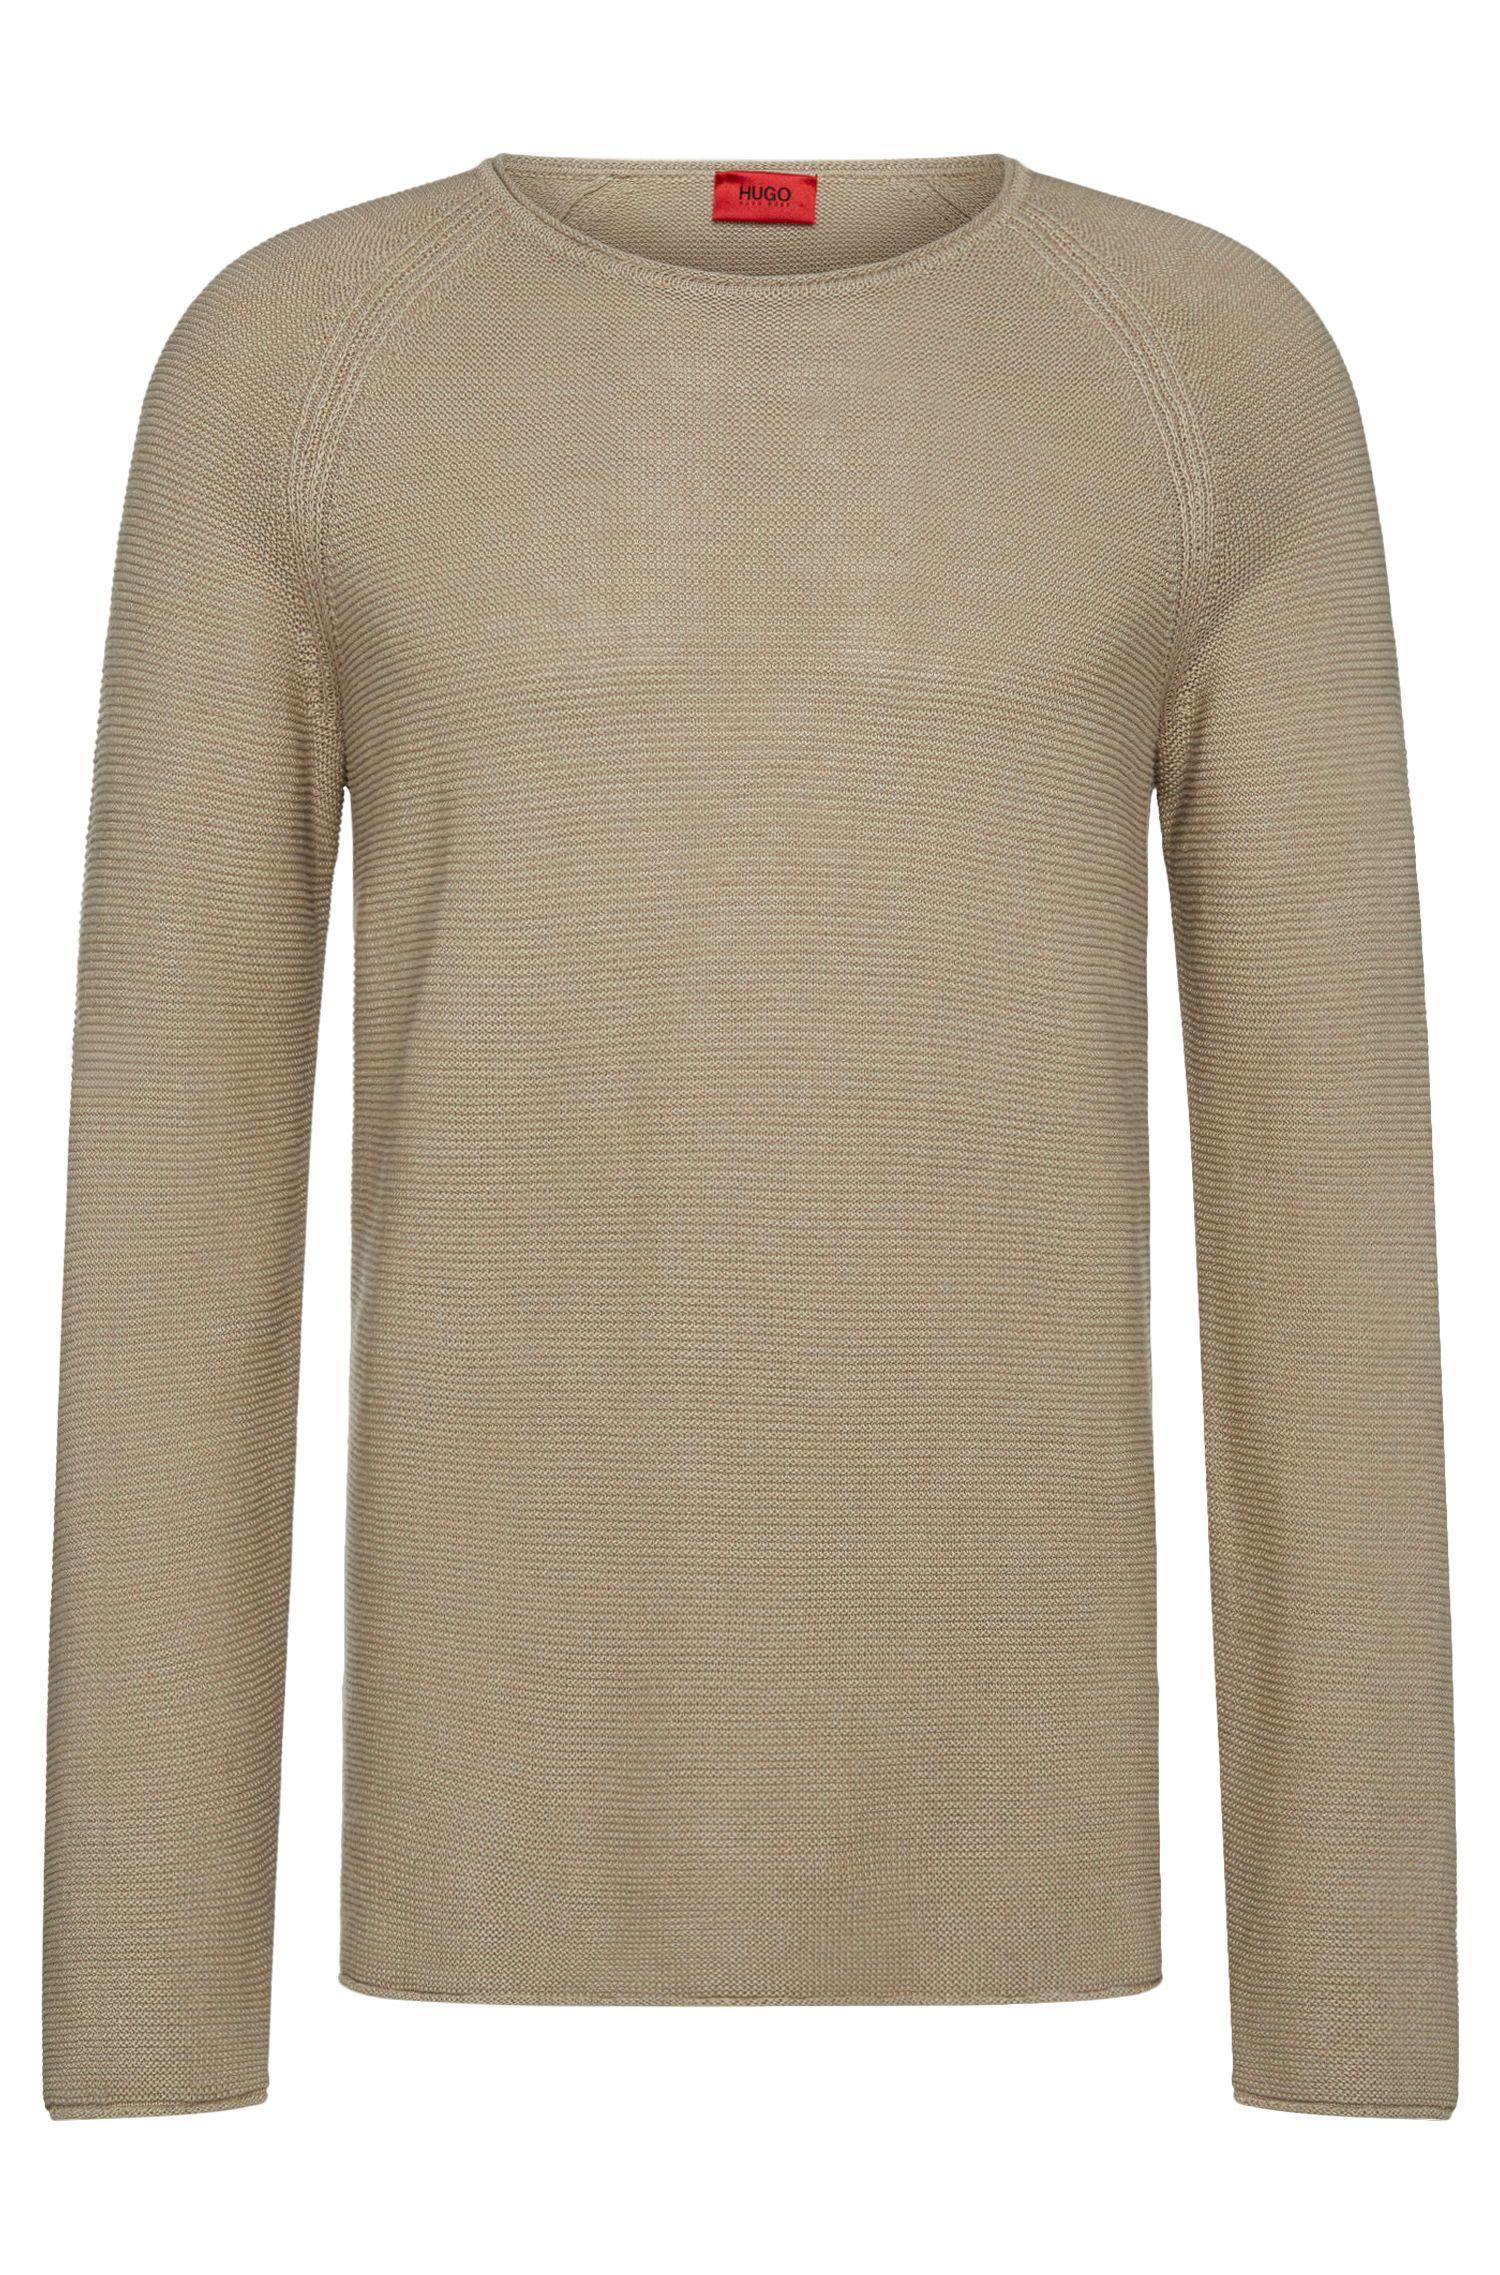 Jersey relaxed fit en mezcla de lino con algodón: 'Soler'